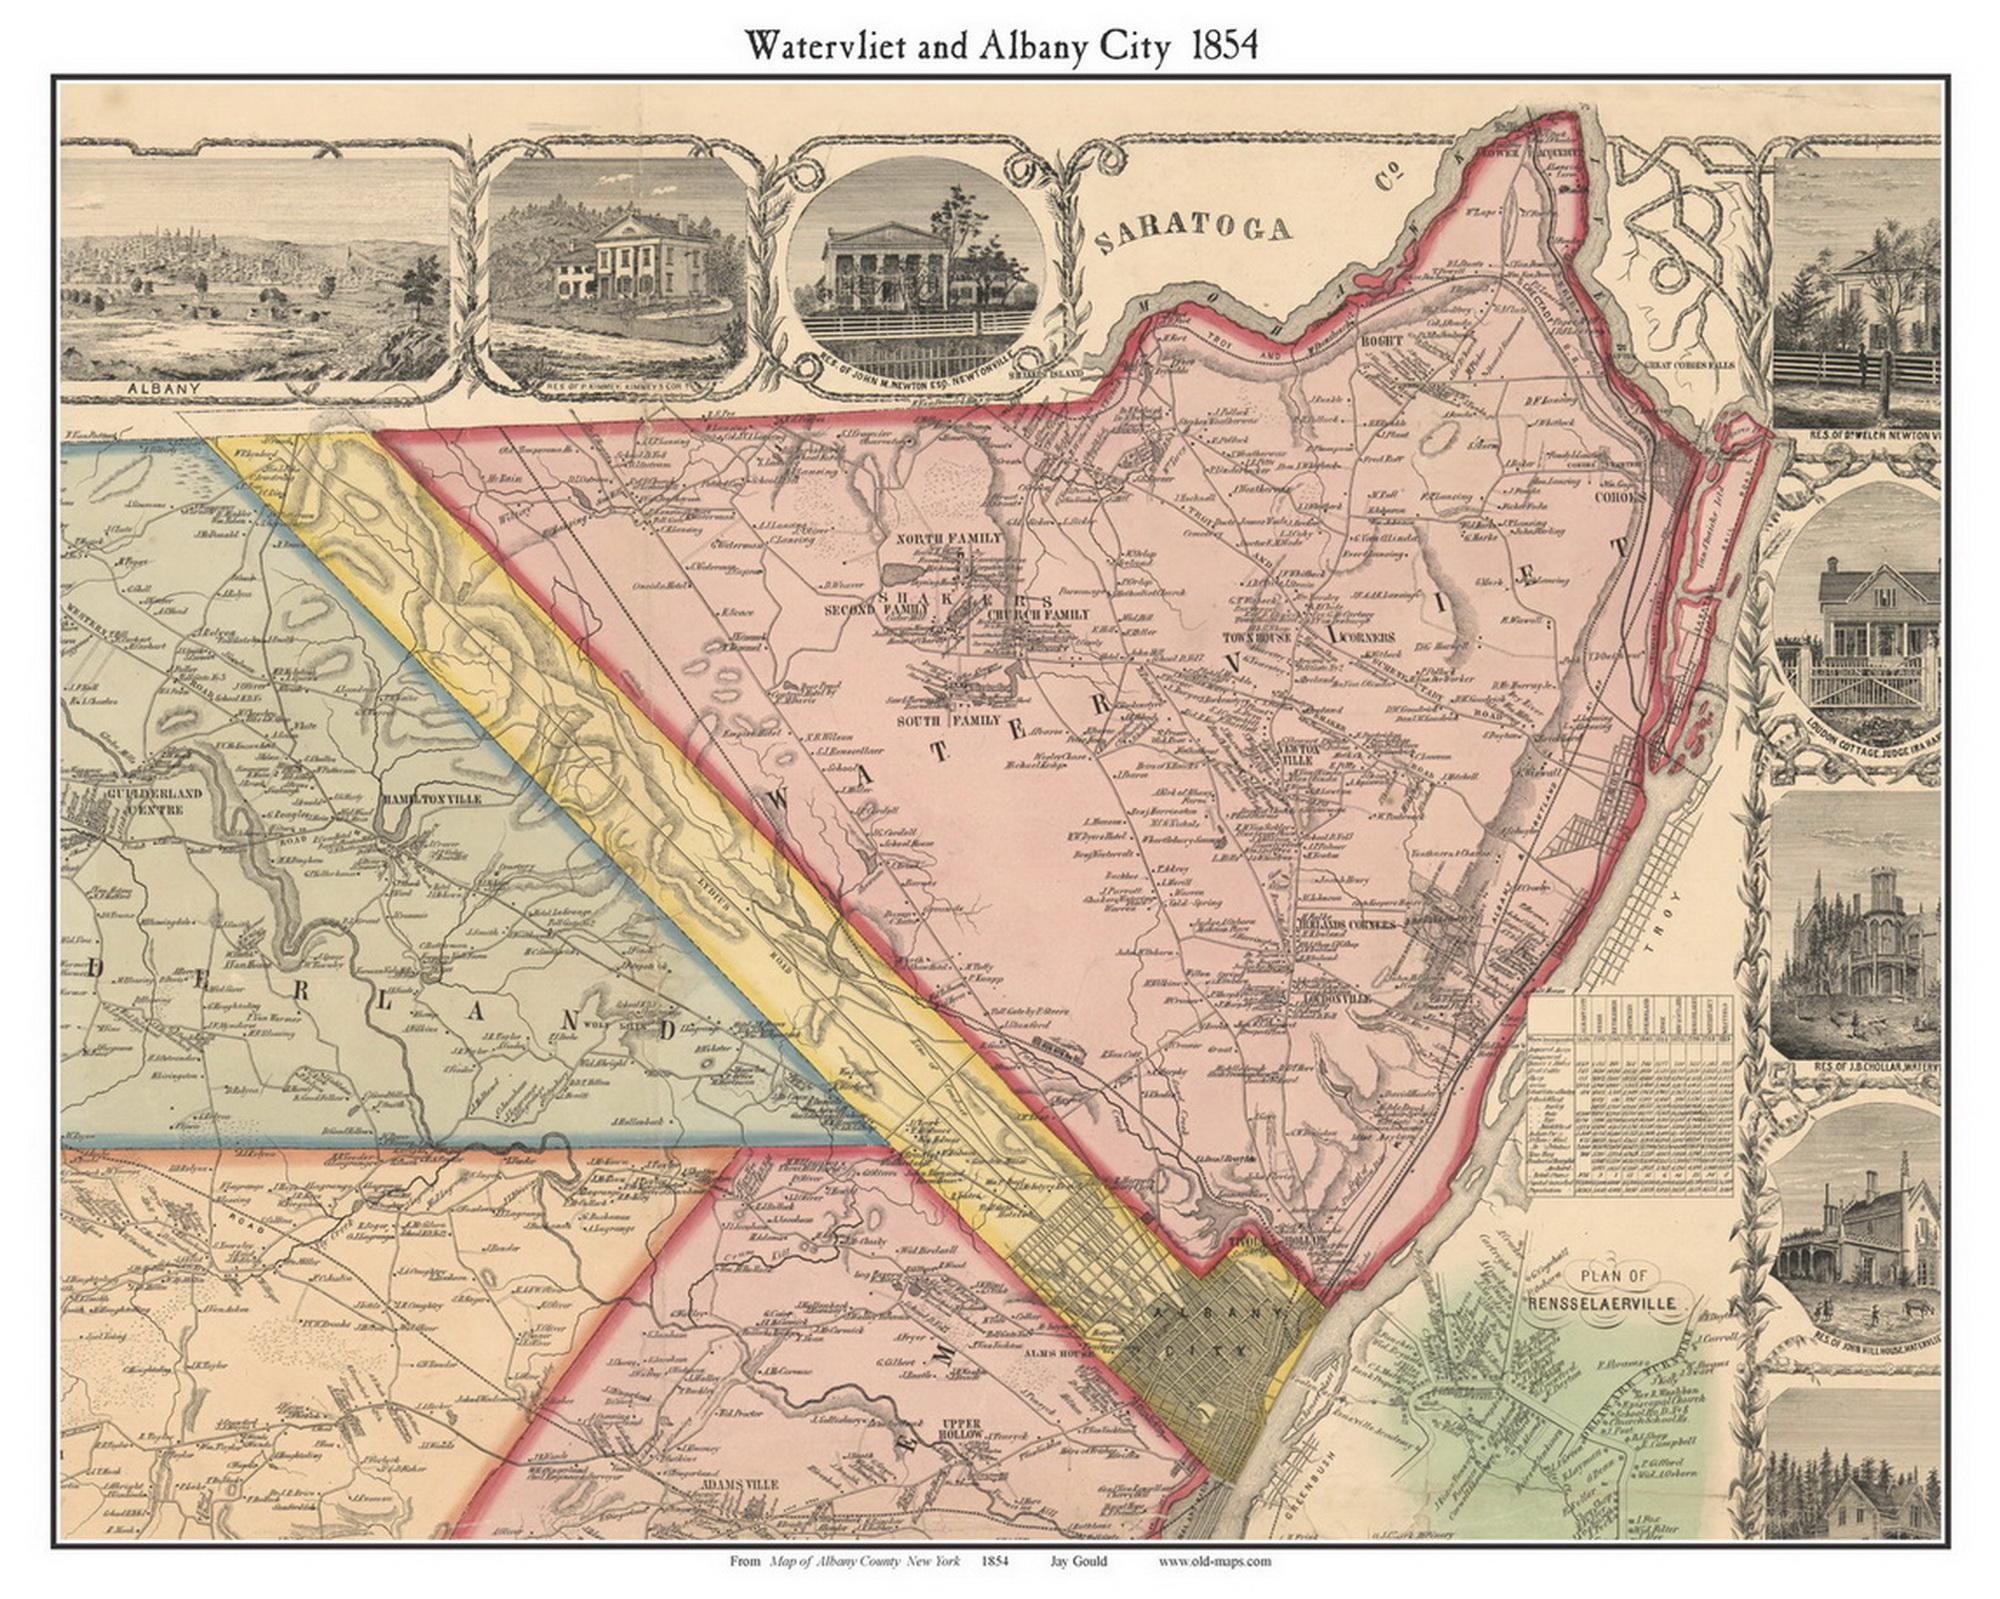 Watervliet Albany City New York 1854 Old Town Map Custom Print